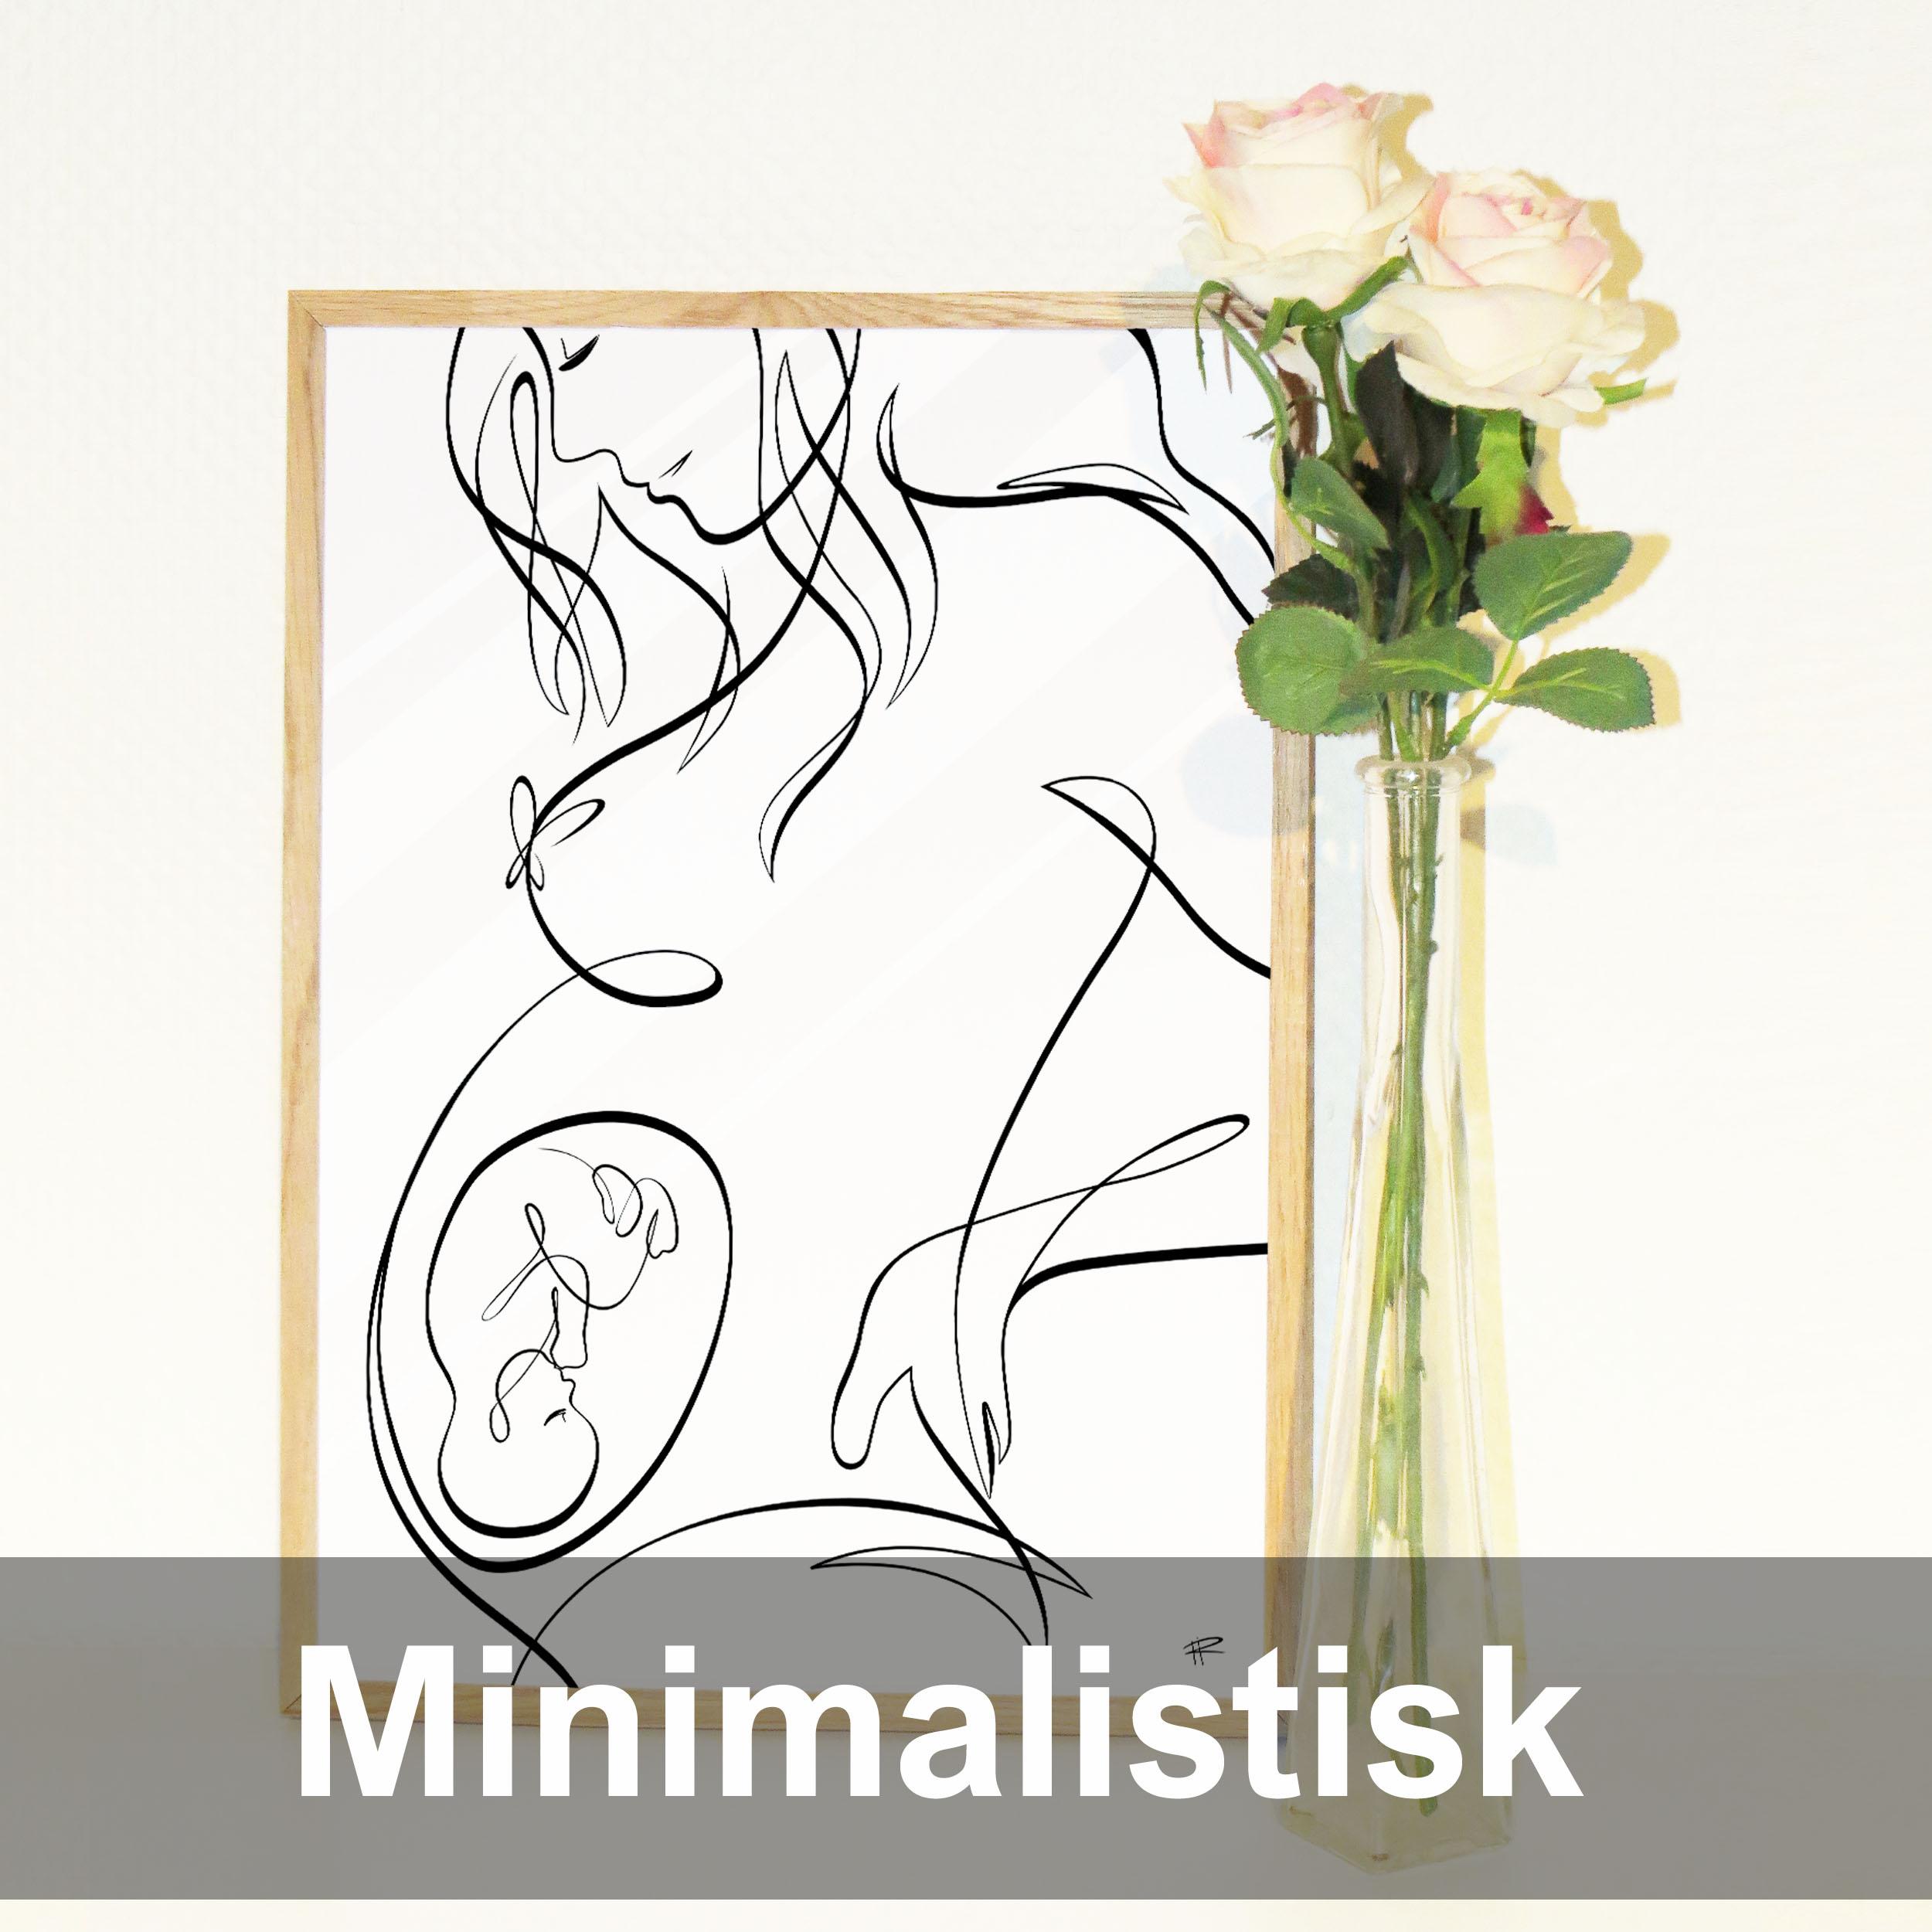 Minimalistisk